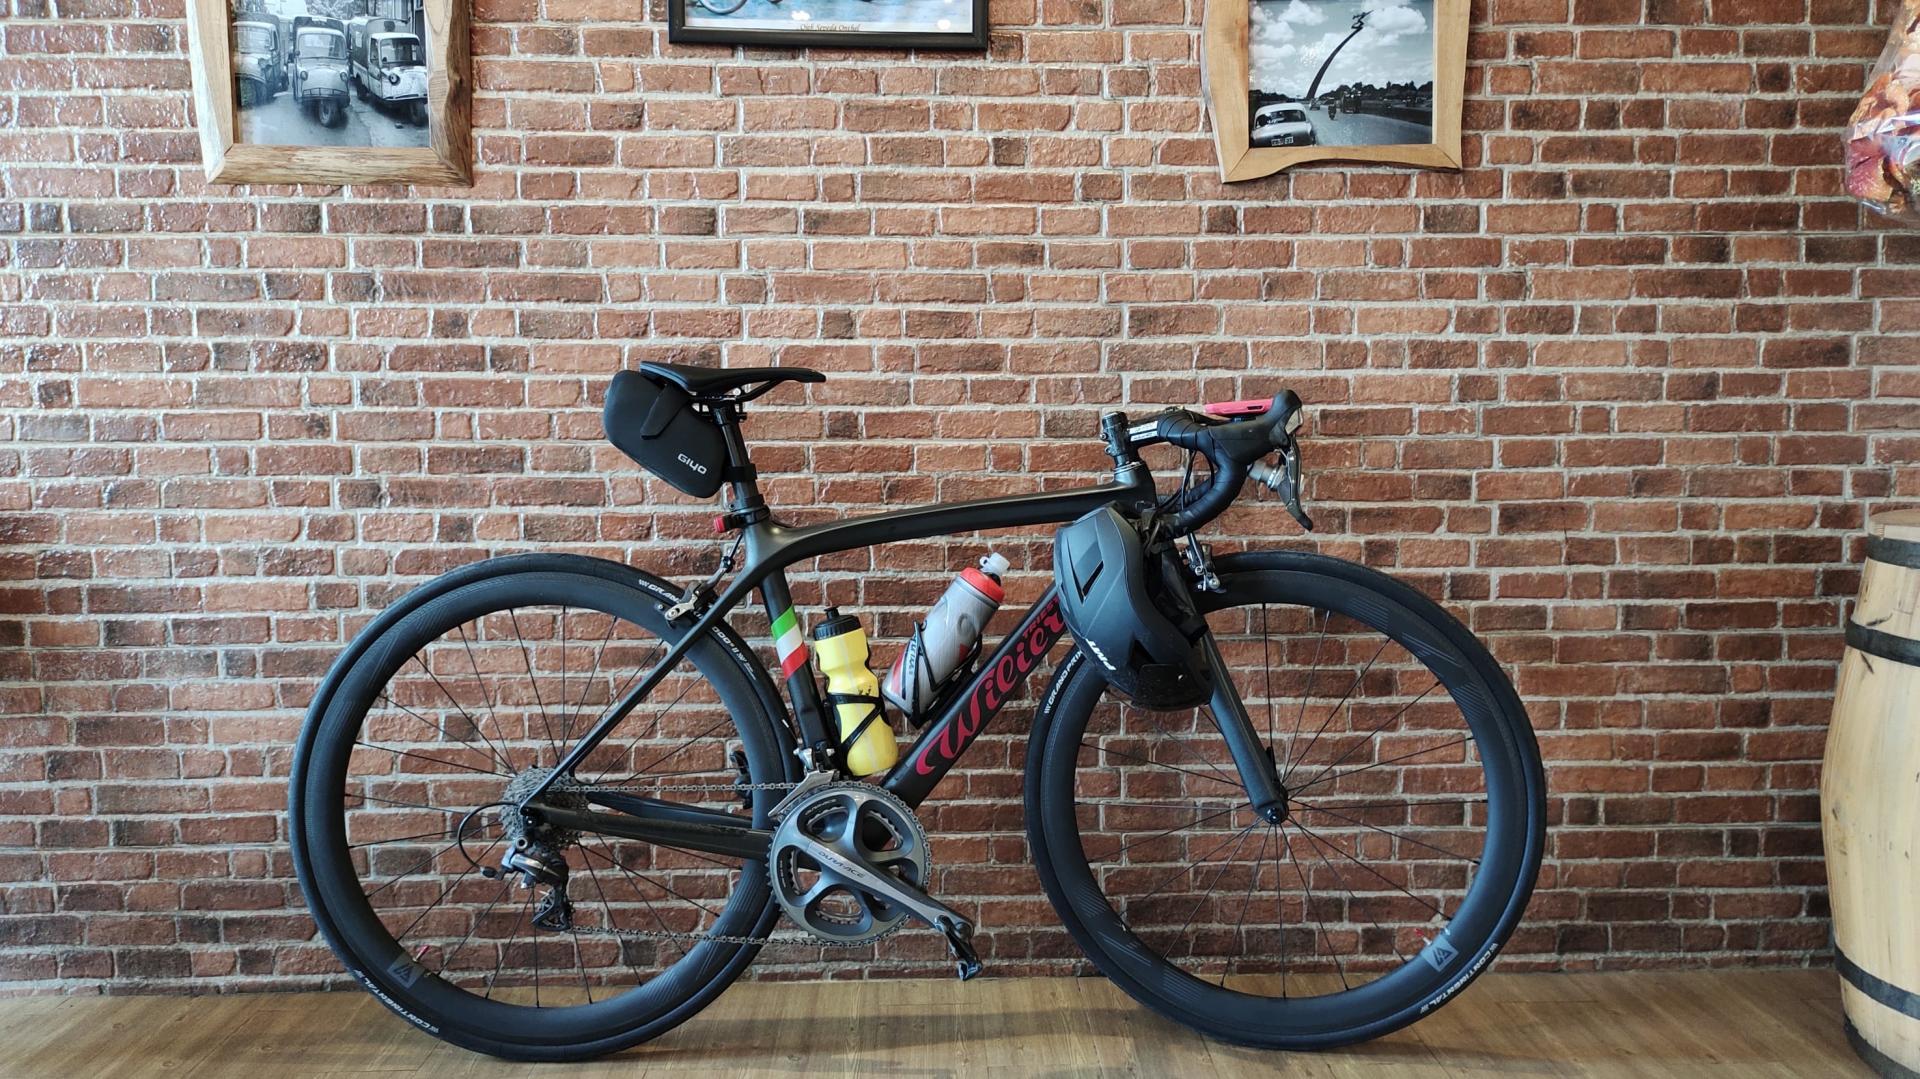 wilier-triestina-road-bike-45mm-carbon-rim-wheels